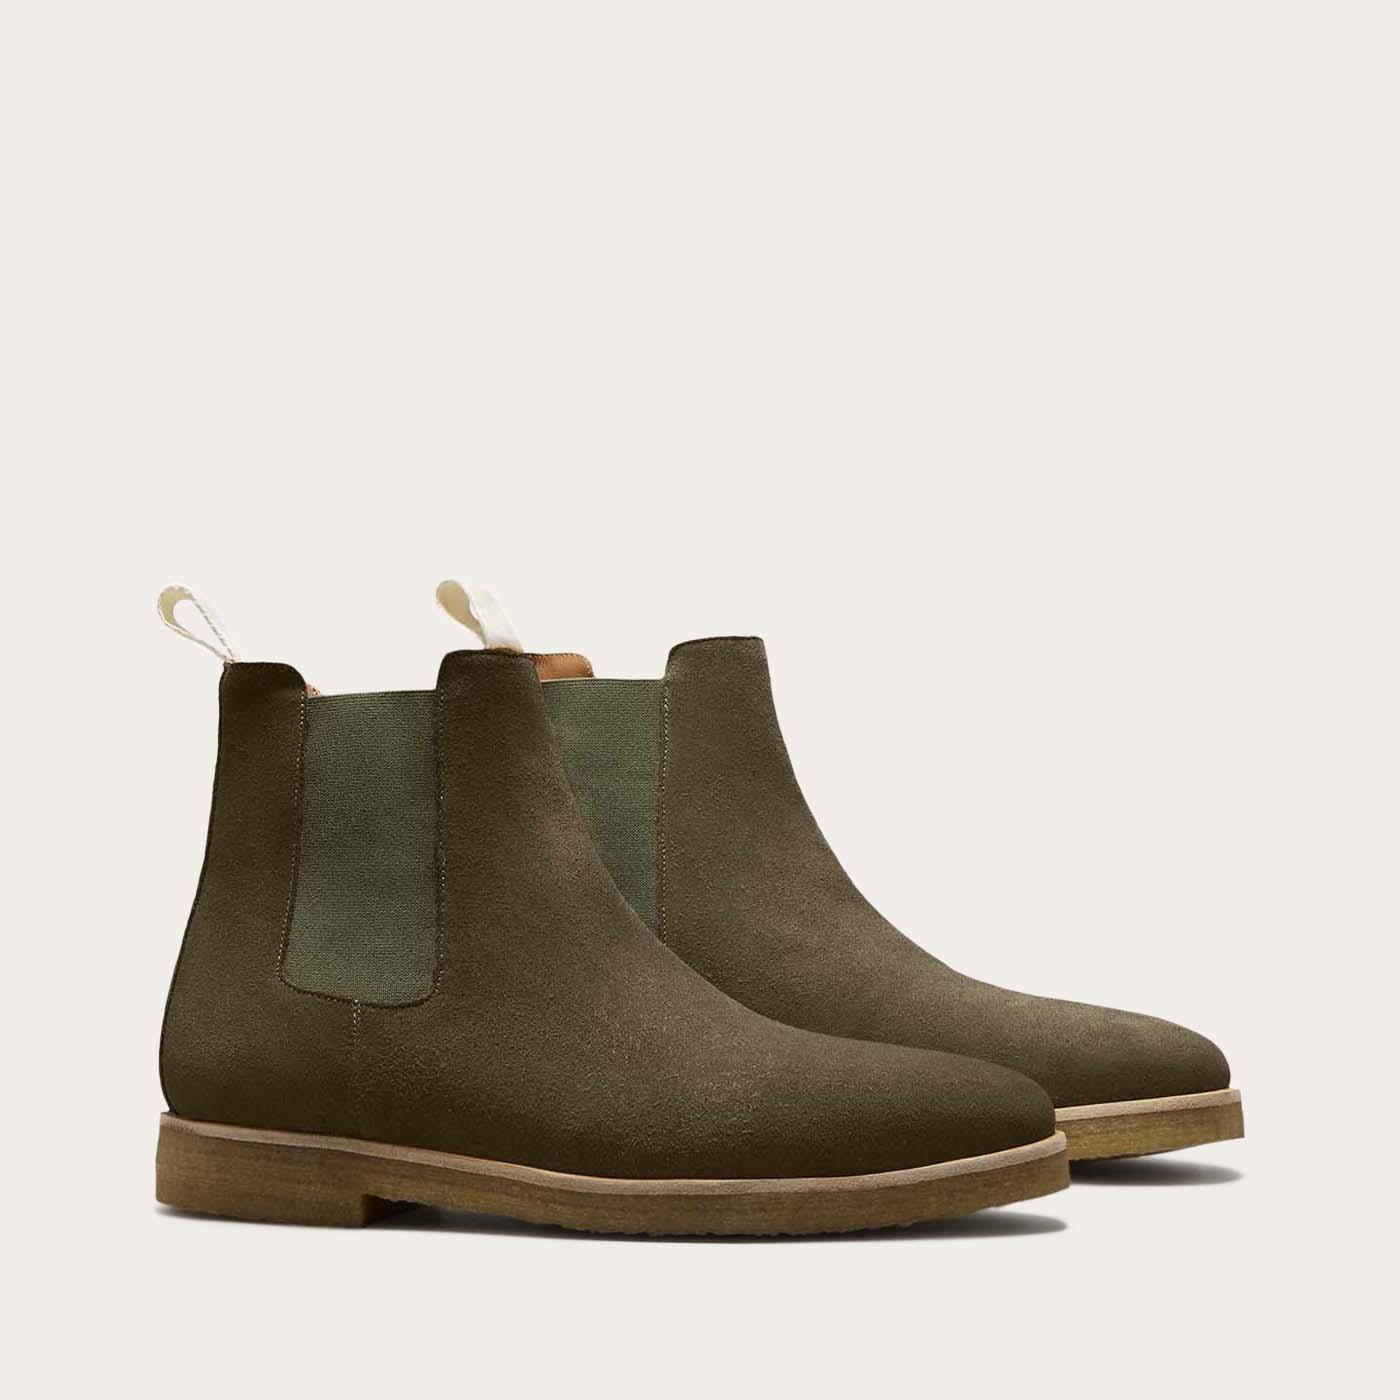 Truffle Chelsea Boots 2